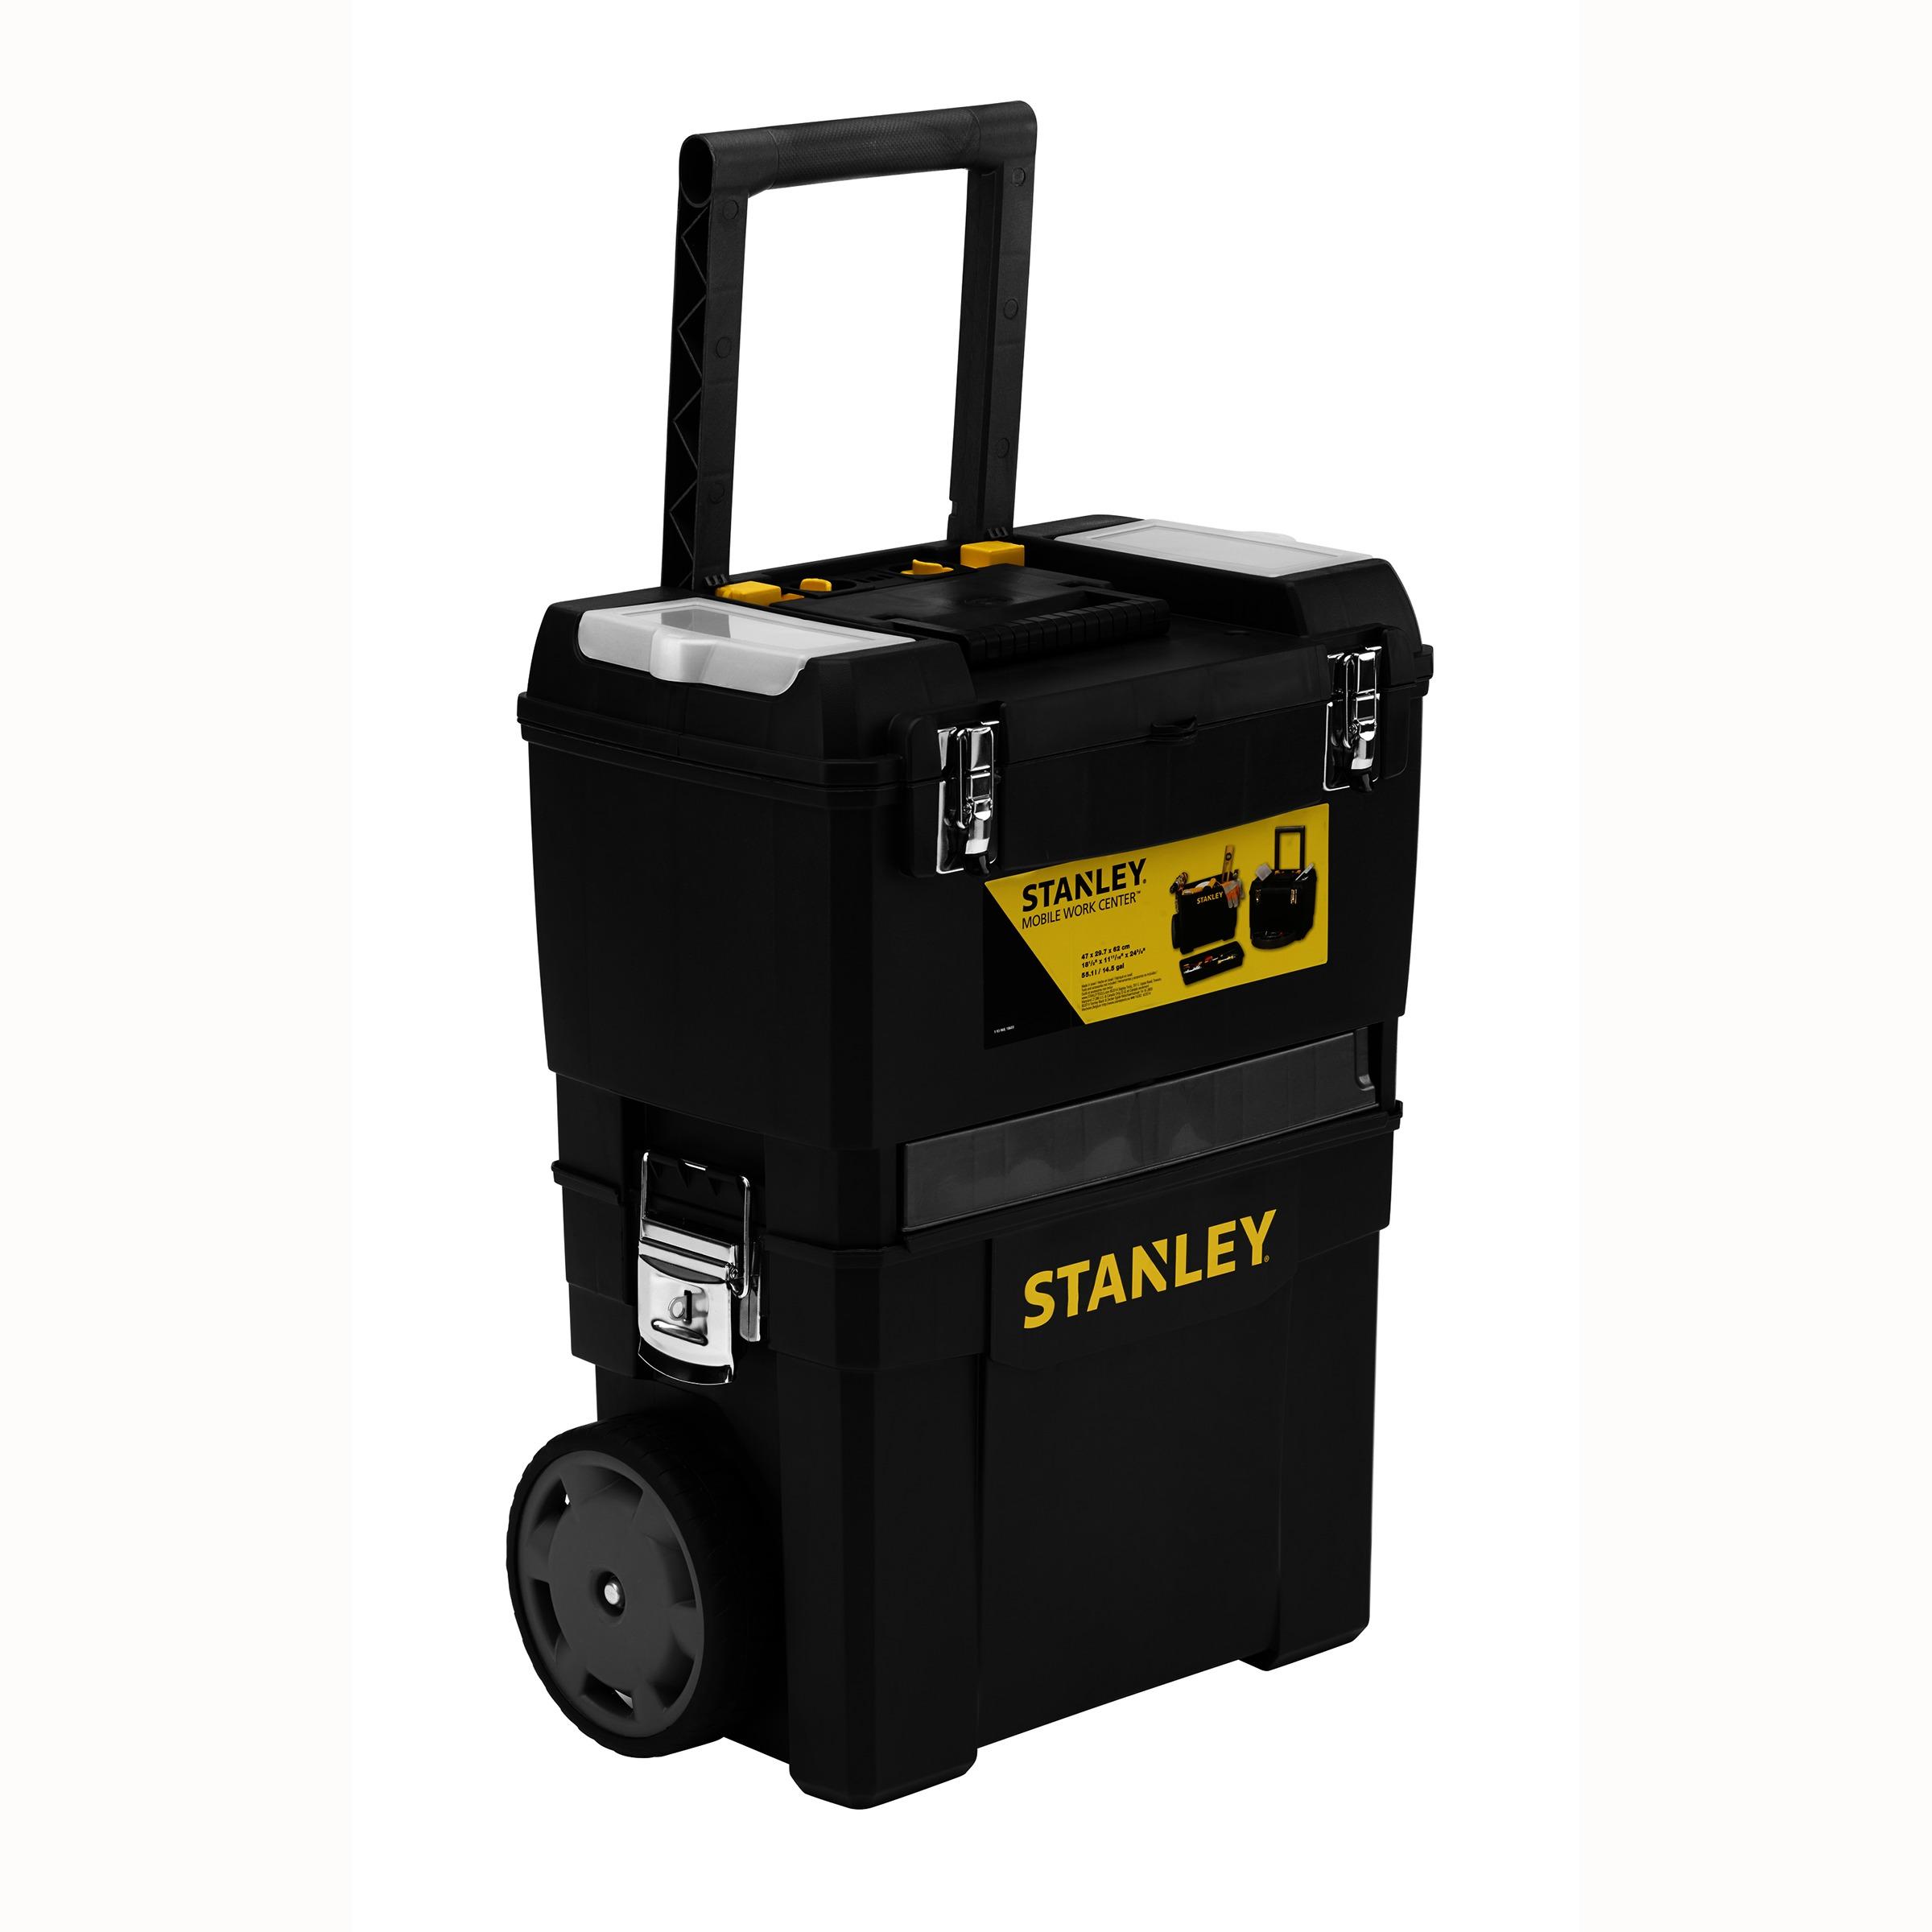 Stanley mobiele werkplaats